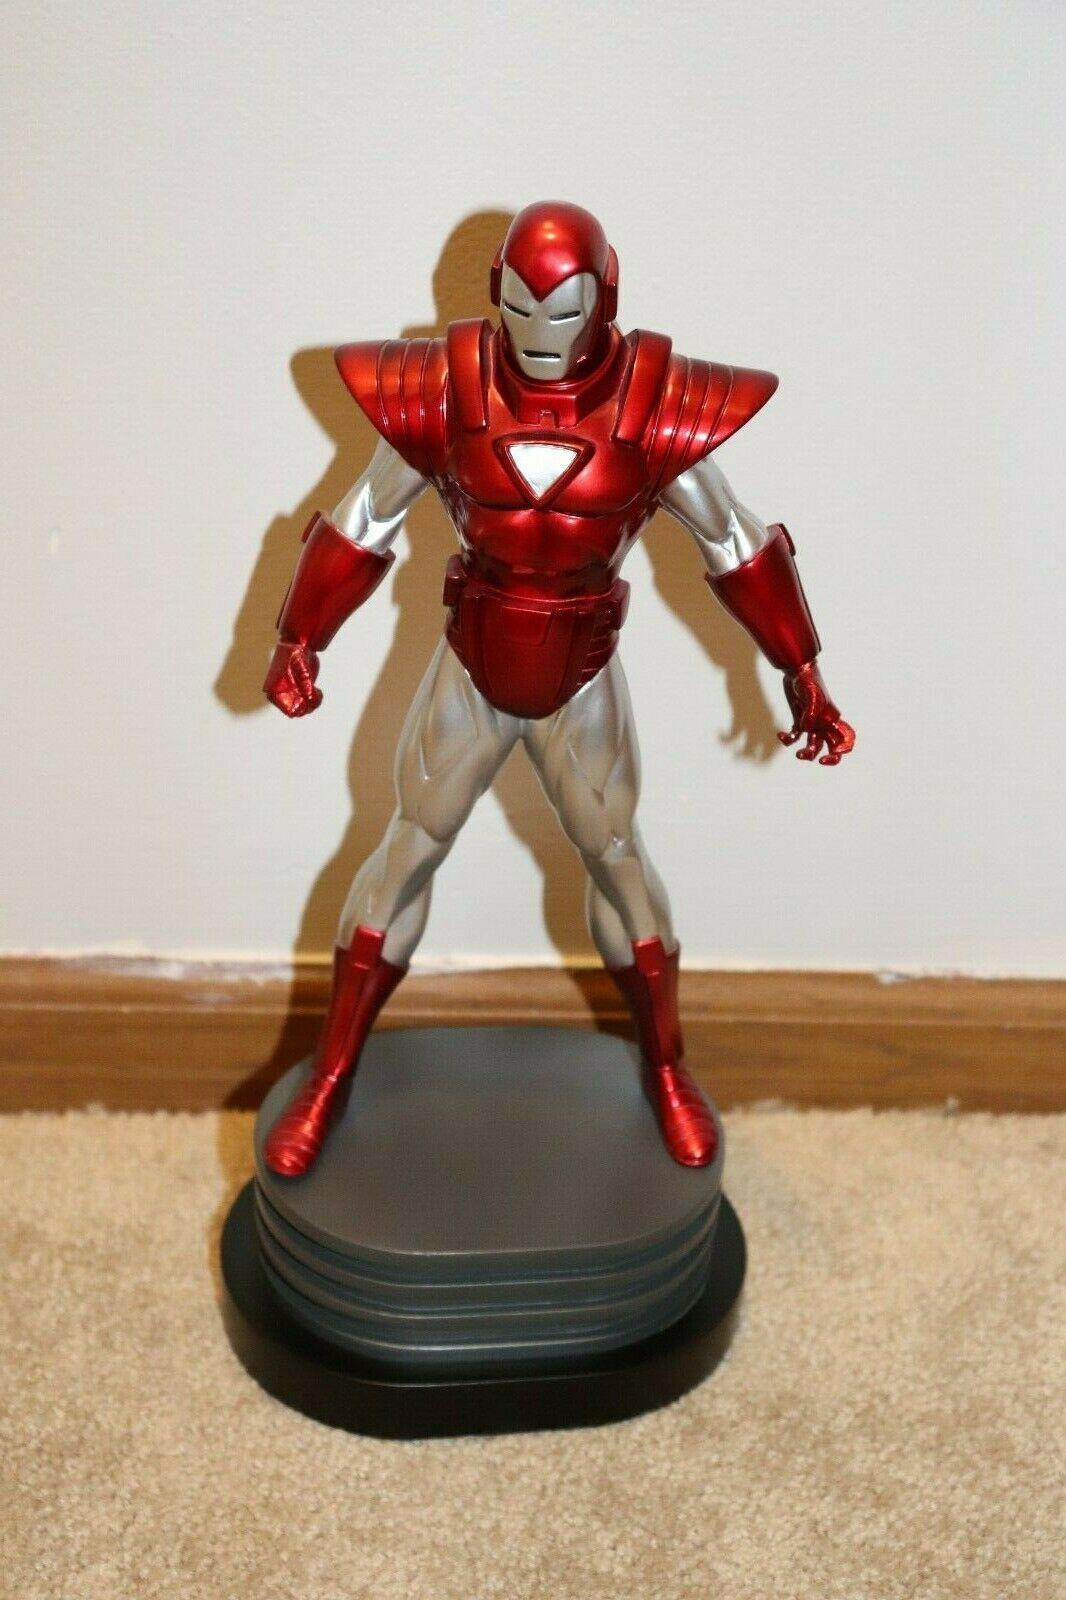 Bowen Iron Man Statue Four Pack -  252/300